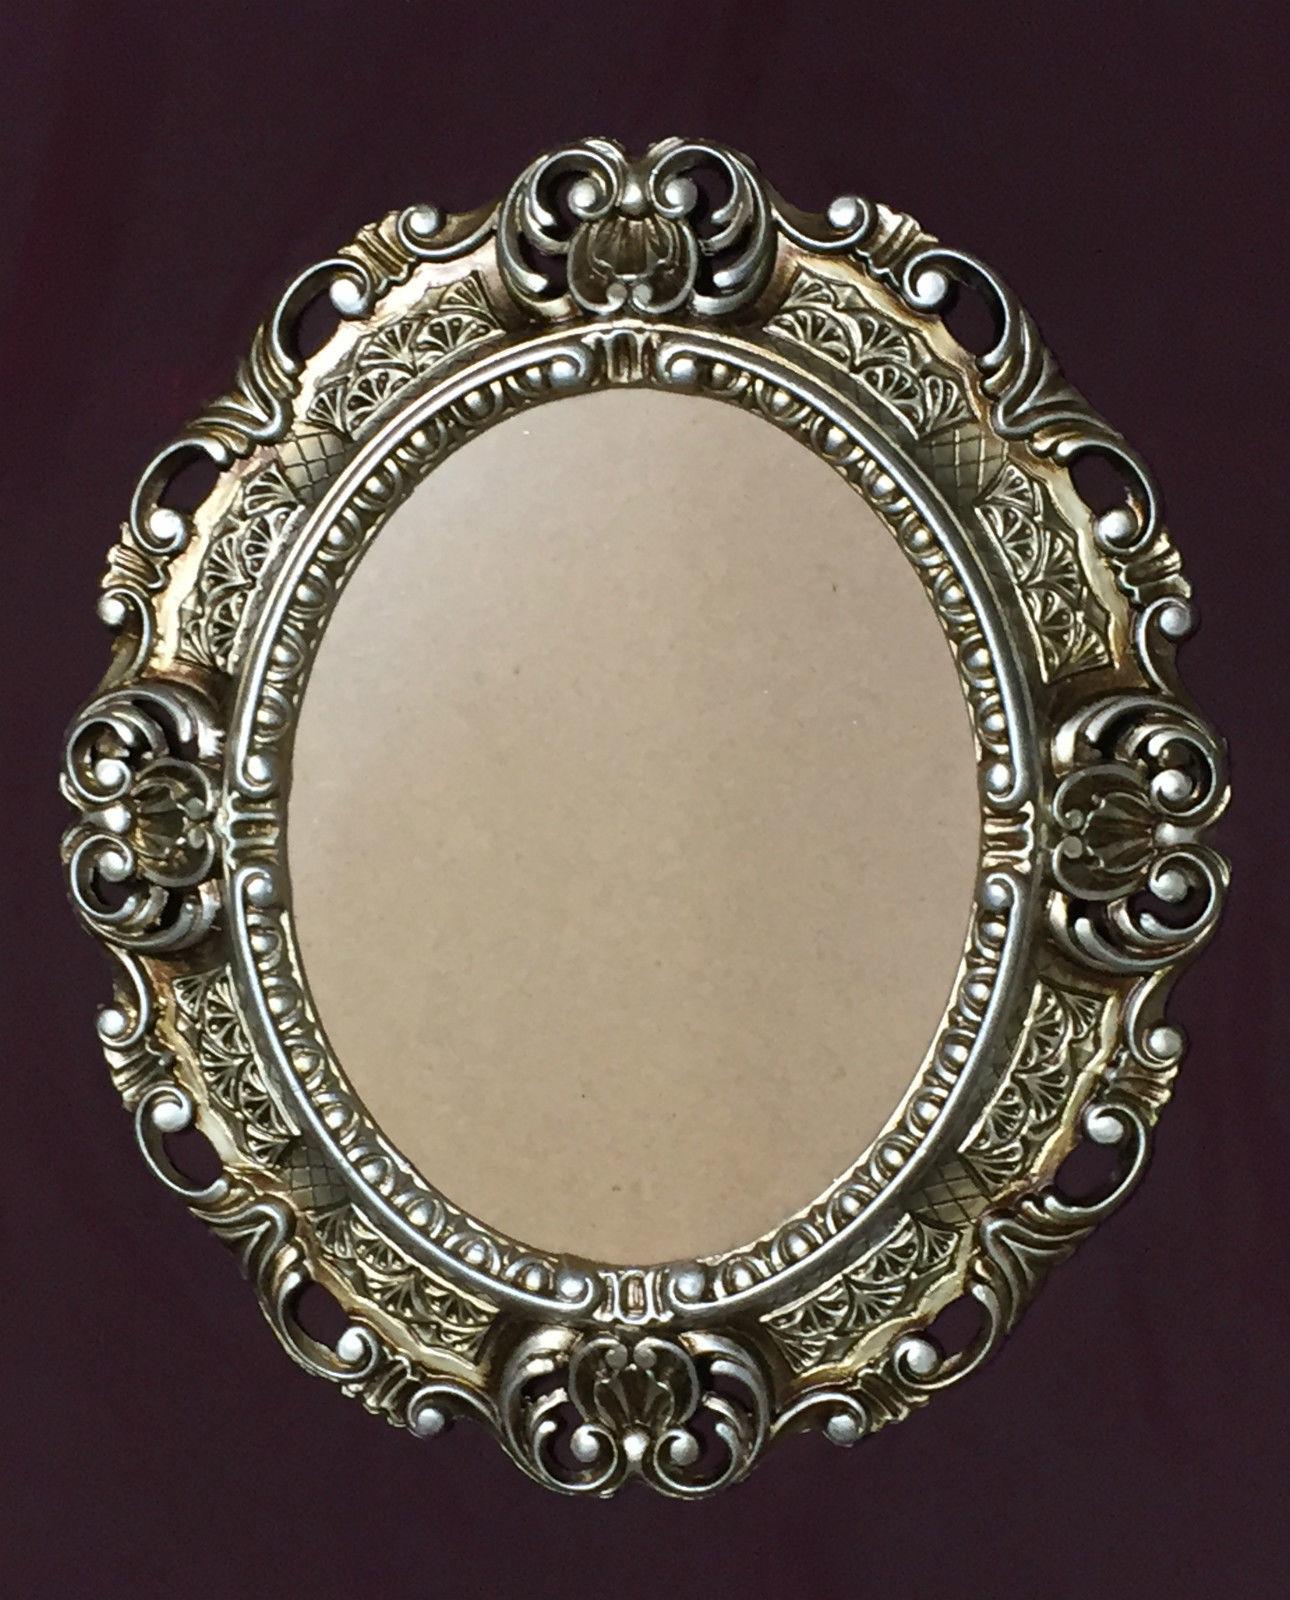 Bilderrahmen Antik Silber Barock Oval 45X37 Fotorahmen Bilderrahmen ...